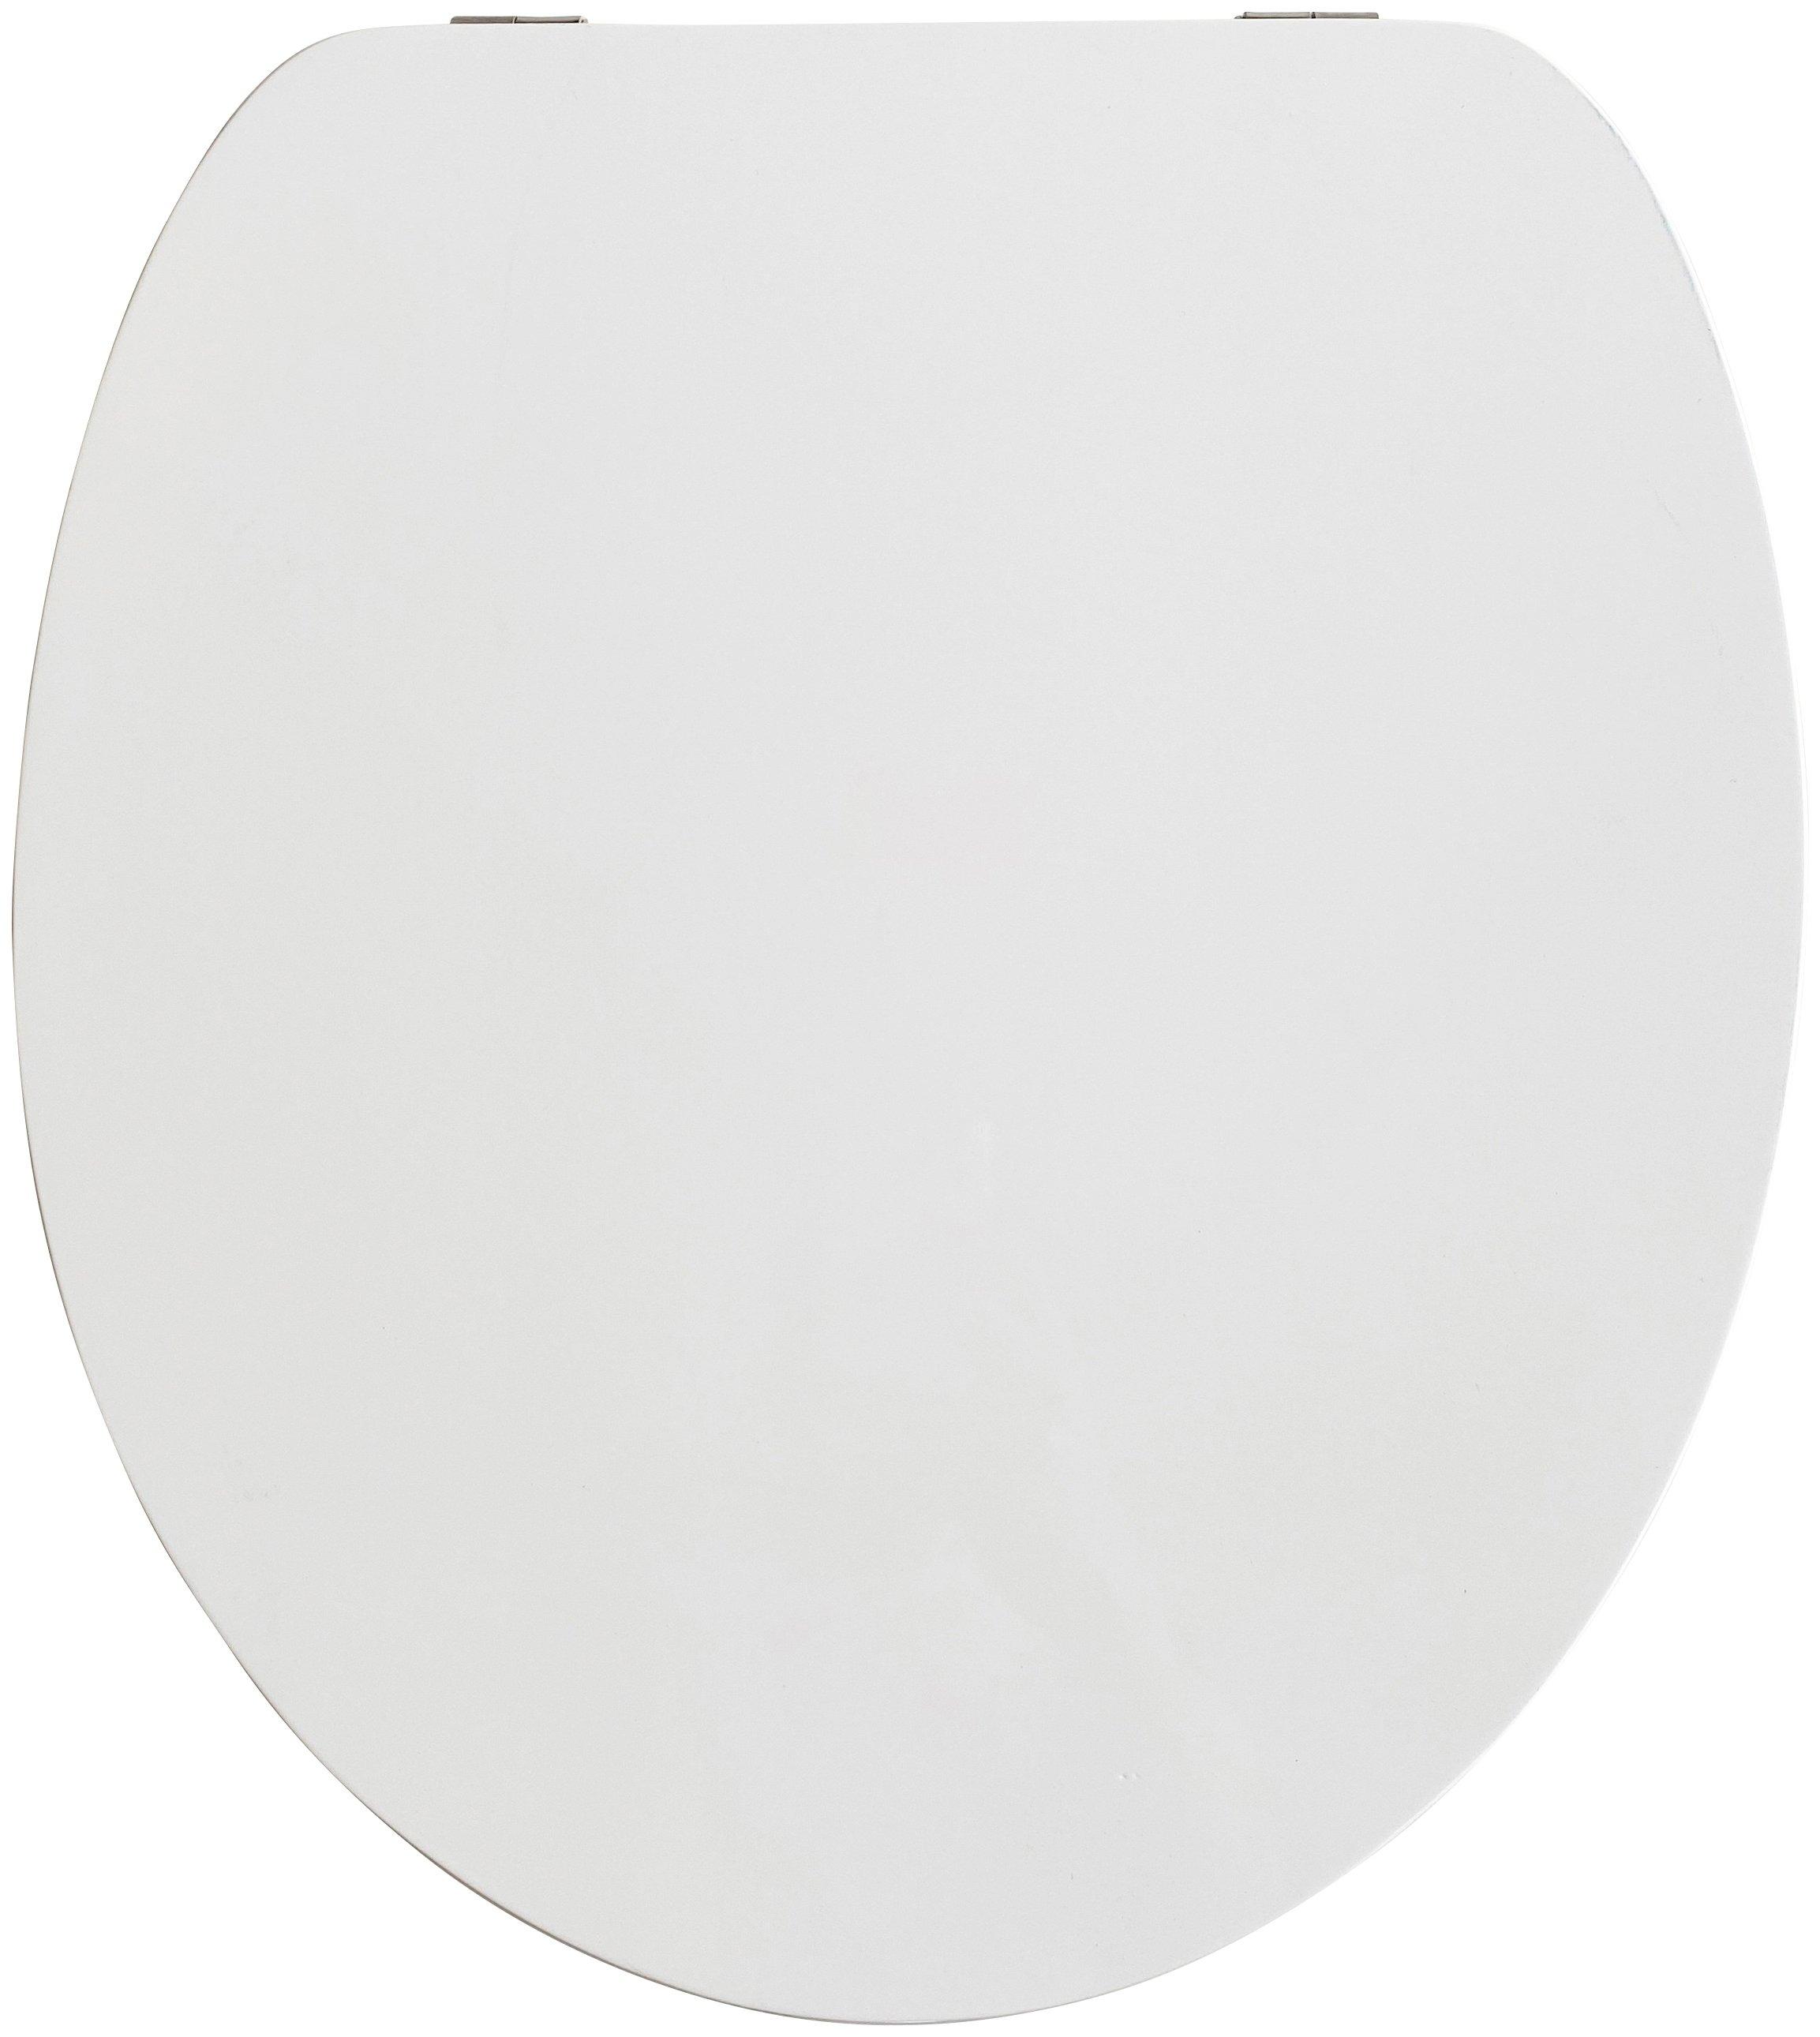 ADOB toiletzitting Modern shape nu online bestellen